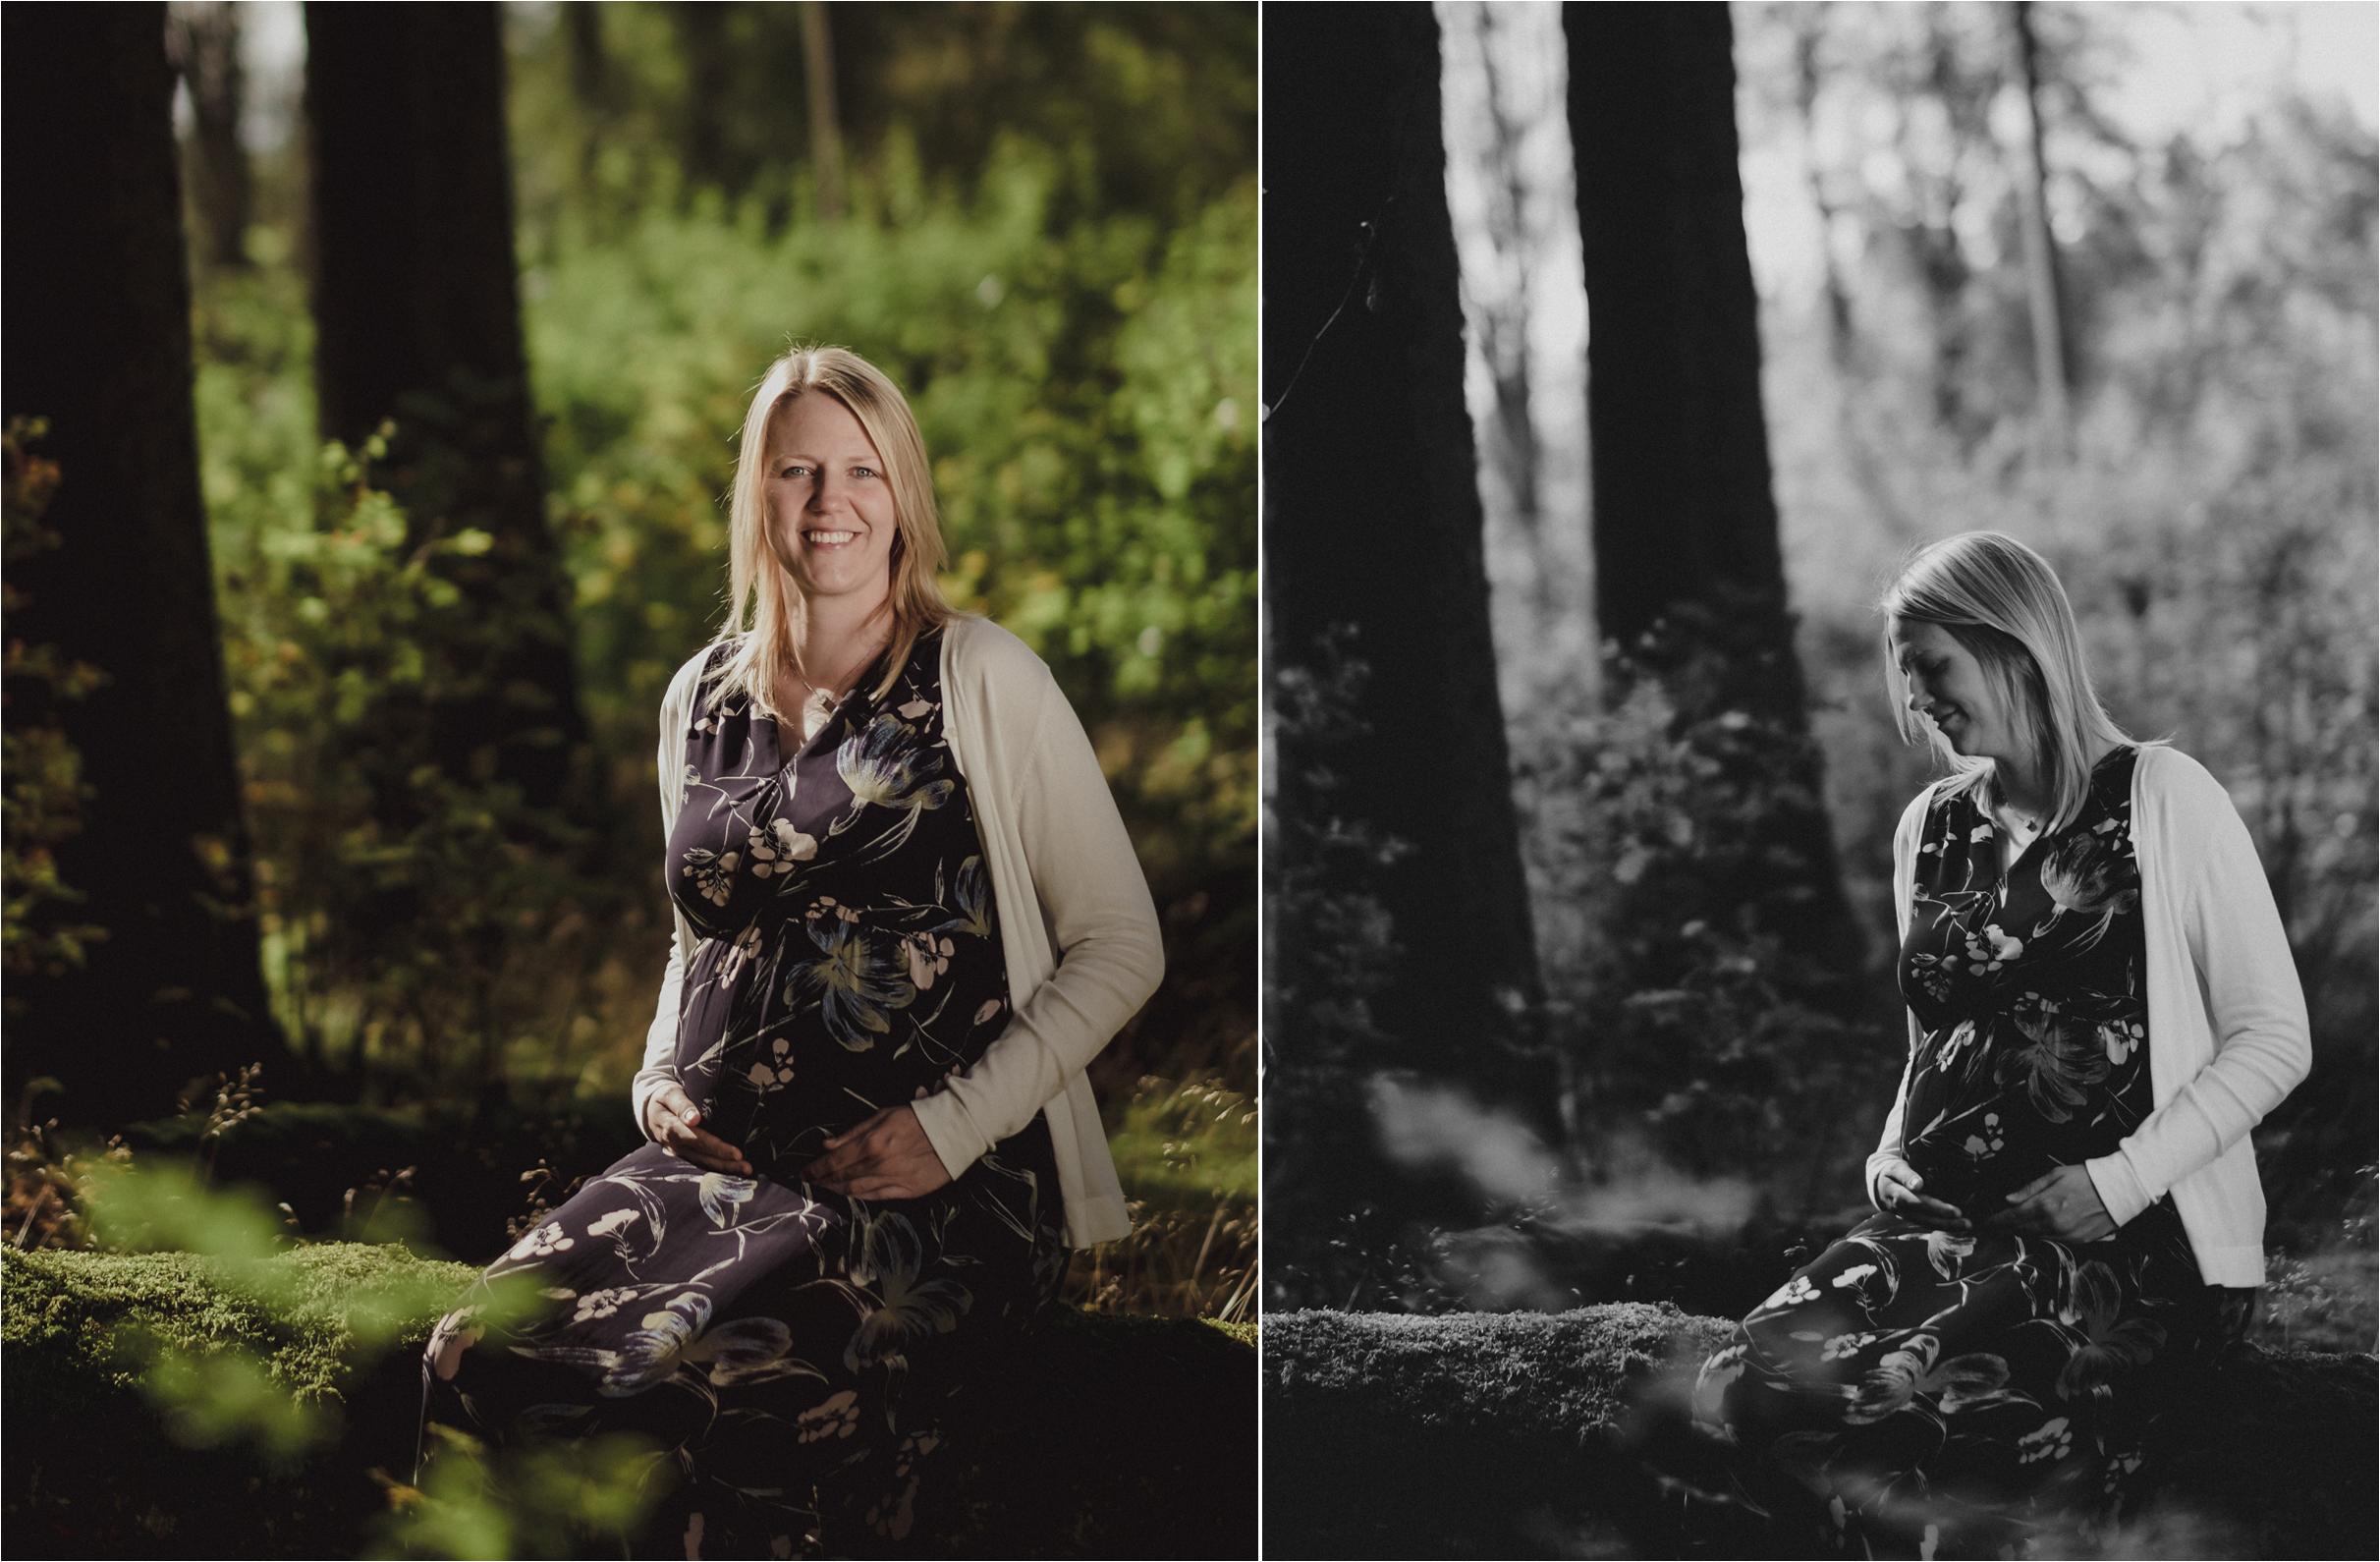 gravidfoto-fotograf-max-norin-29 kopiera.jpg